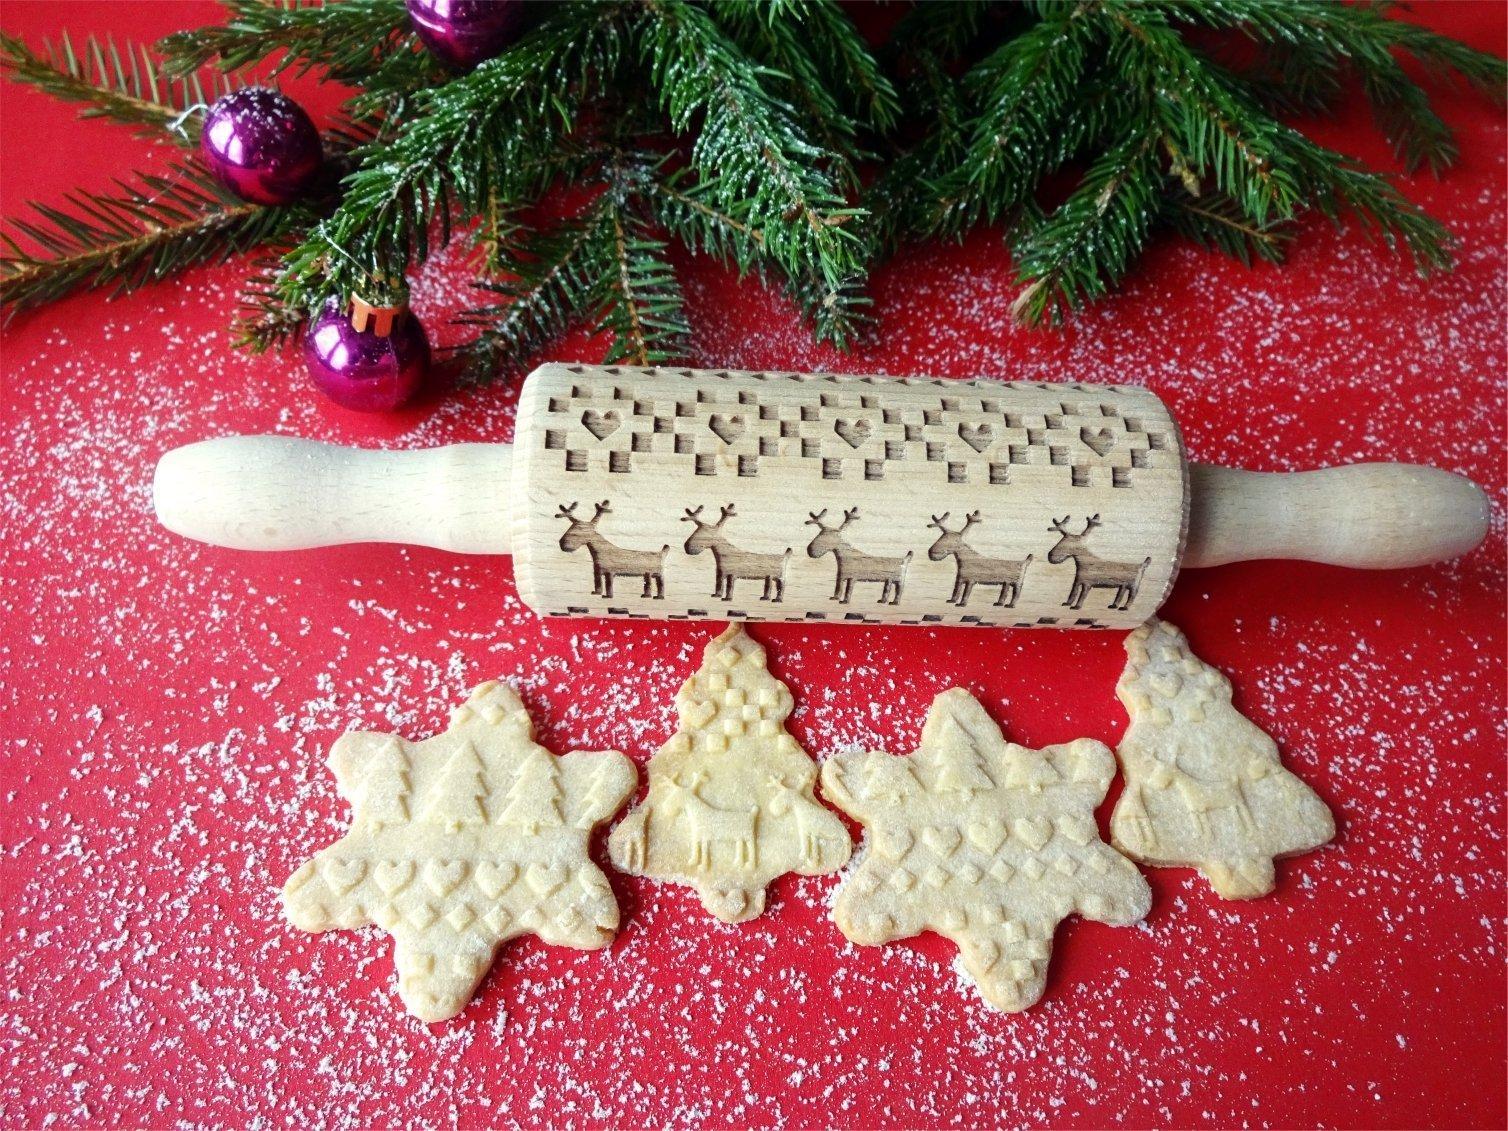 Scandinavian CHRISTMAS Embossing rolling pin for kids with Christmas elk deer pattern